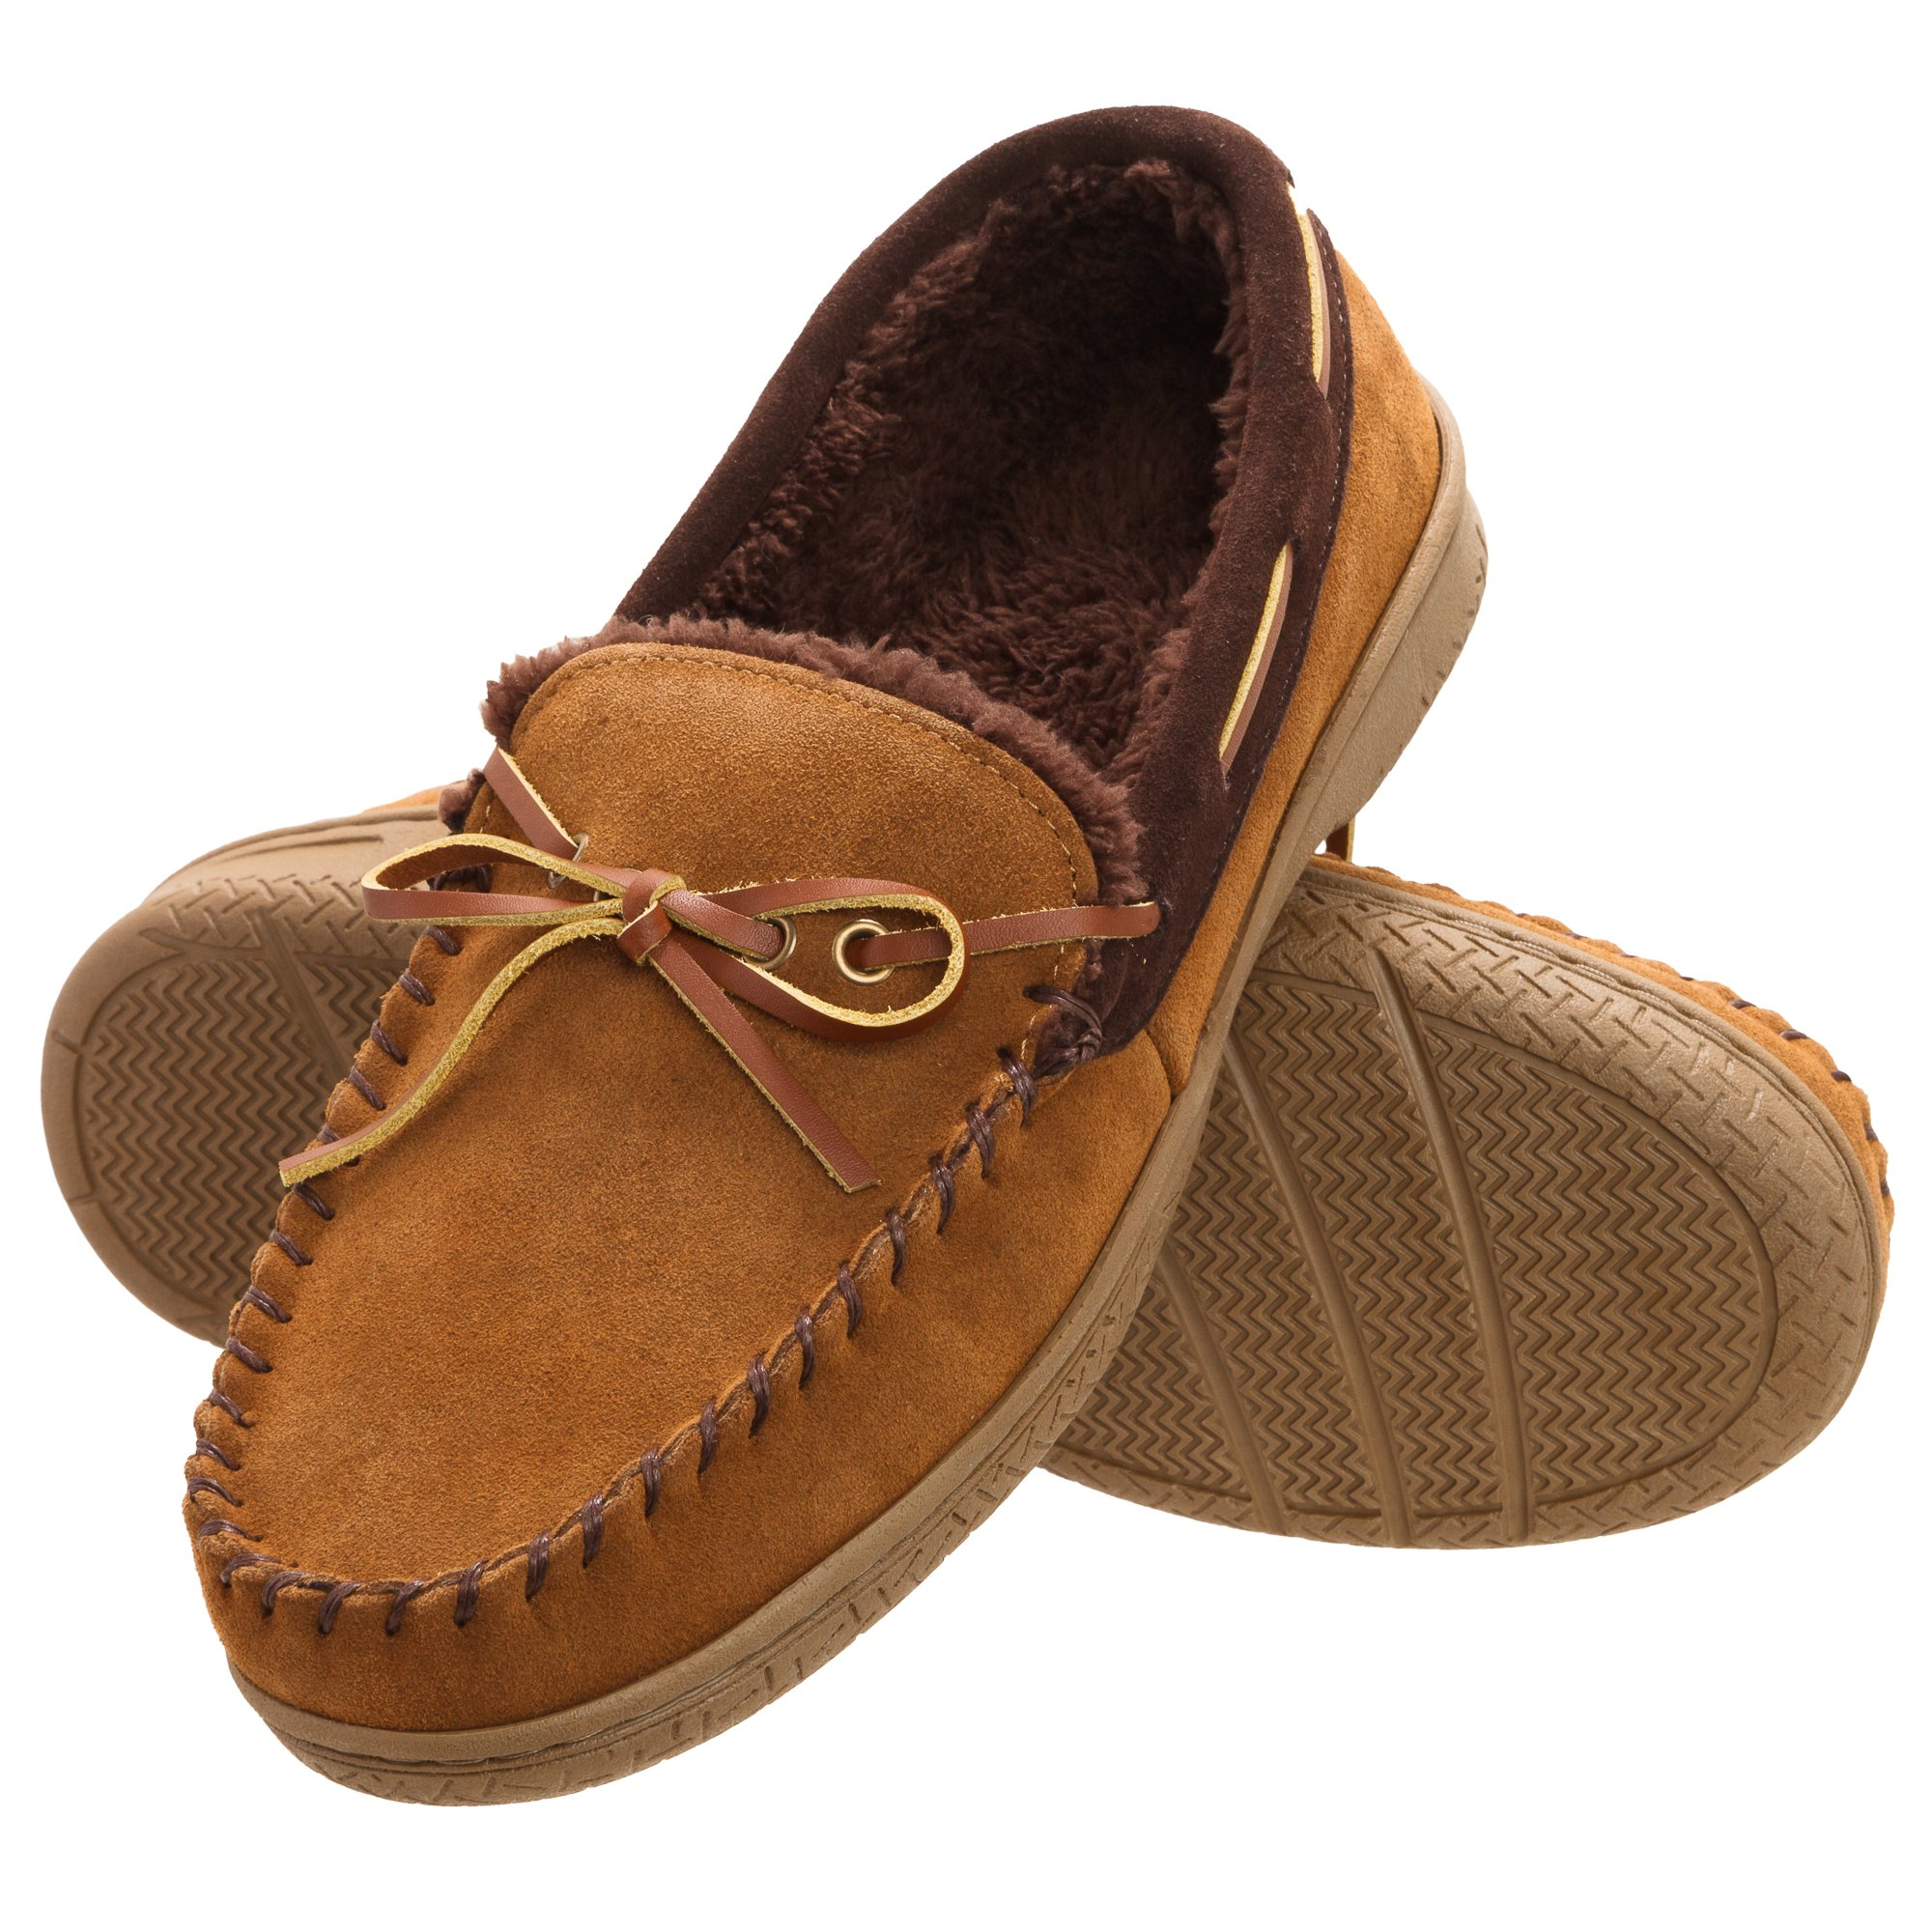 Heat Edge Mens Memory Foam Suede Slip on Indoor/Outdoor Moccasin Slipper Shoe (11, Tan) by Heat Edge (Image #1)